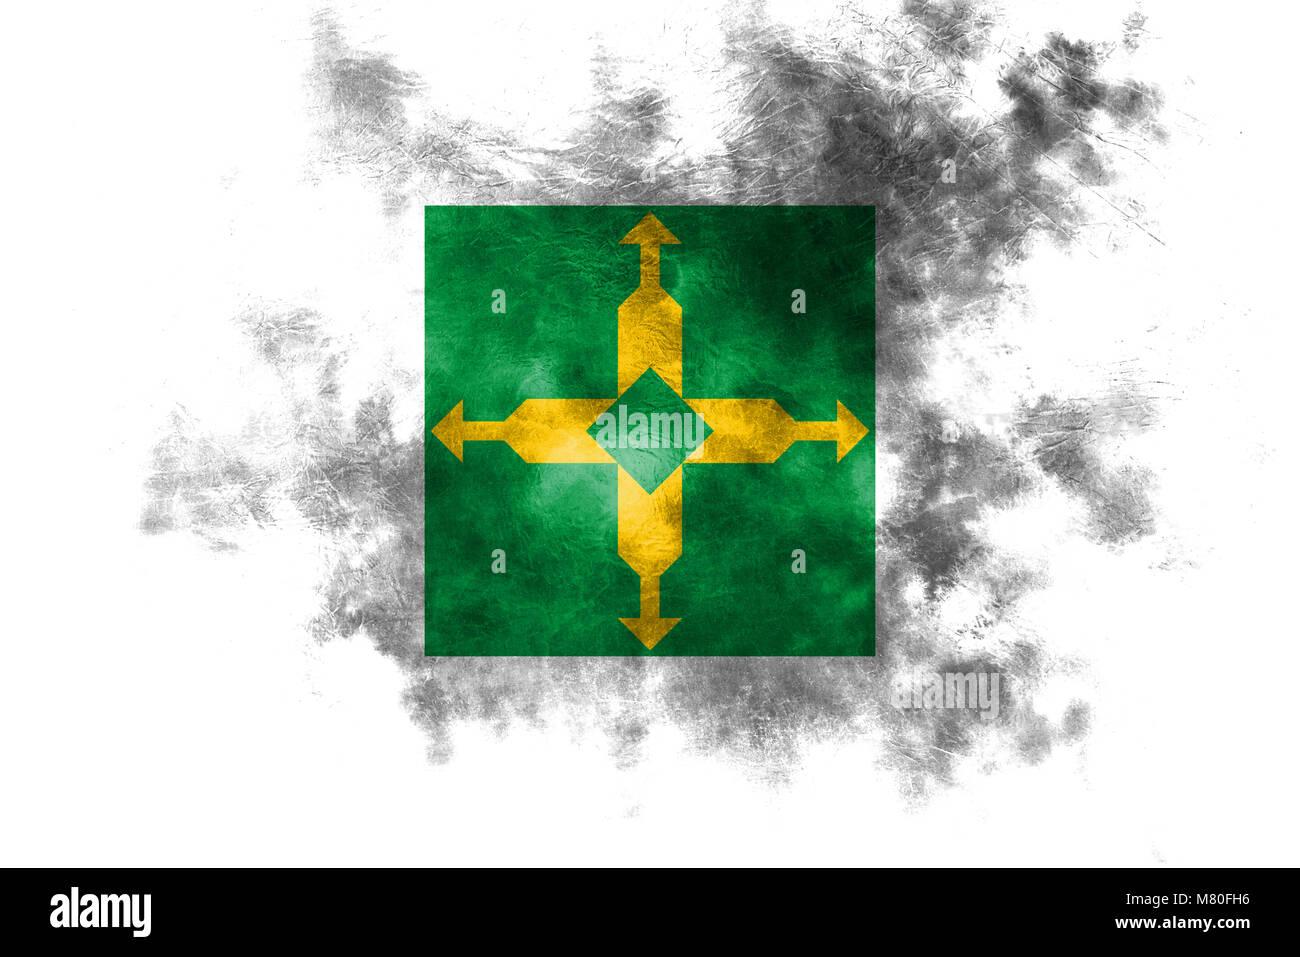 Distrito Federal grunge flag, Ciudad de Mexico Stock Photo